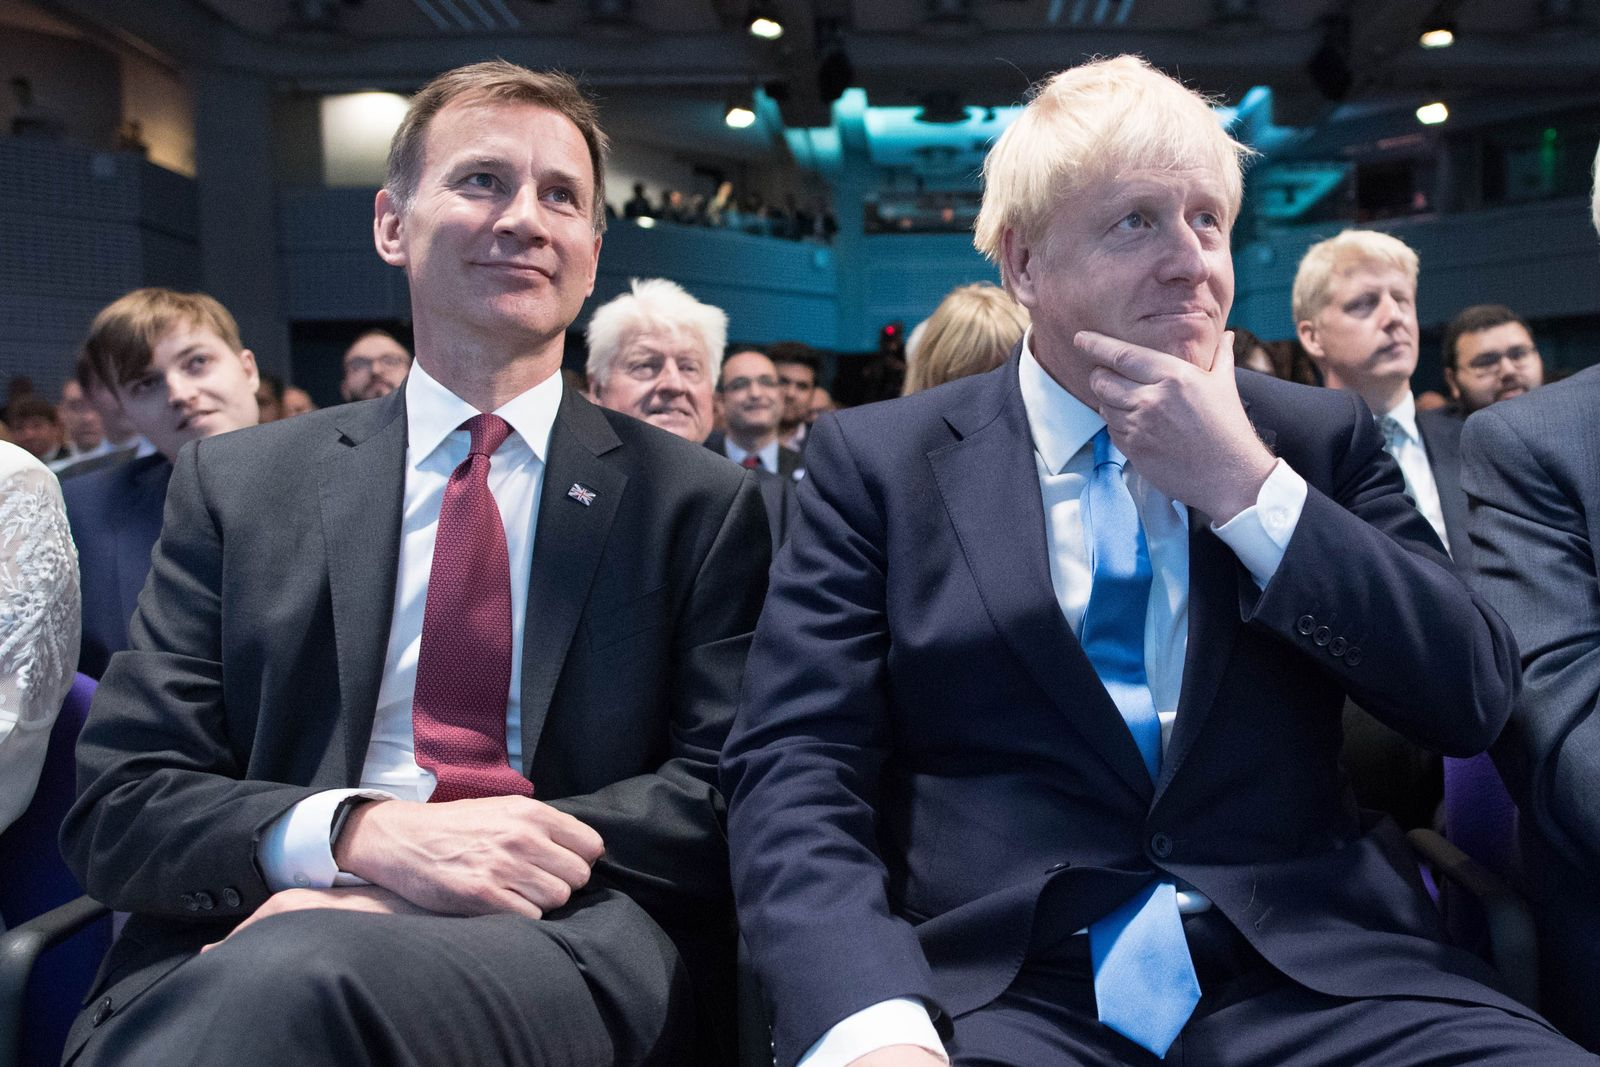 Boris Johnson/Jeremy Hunt